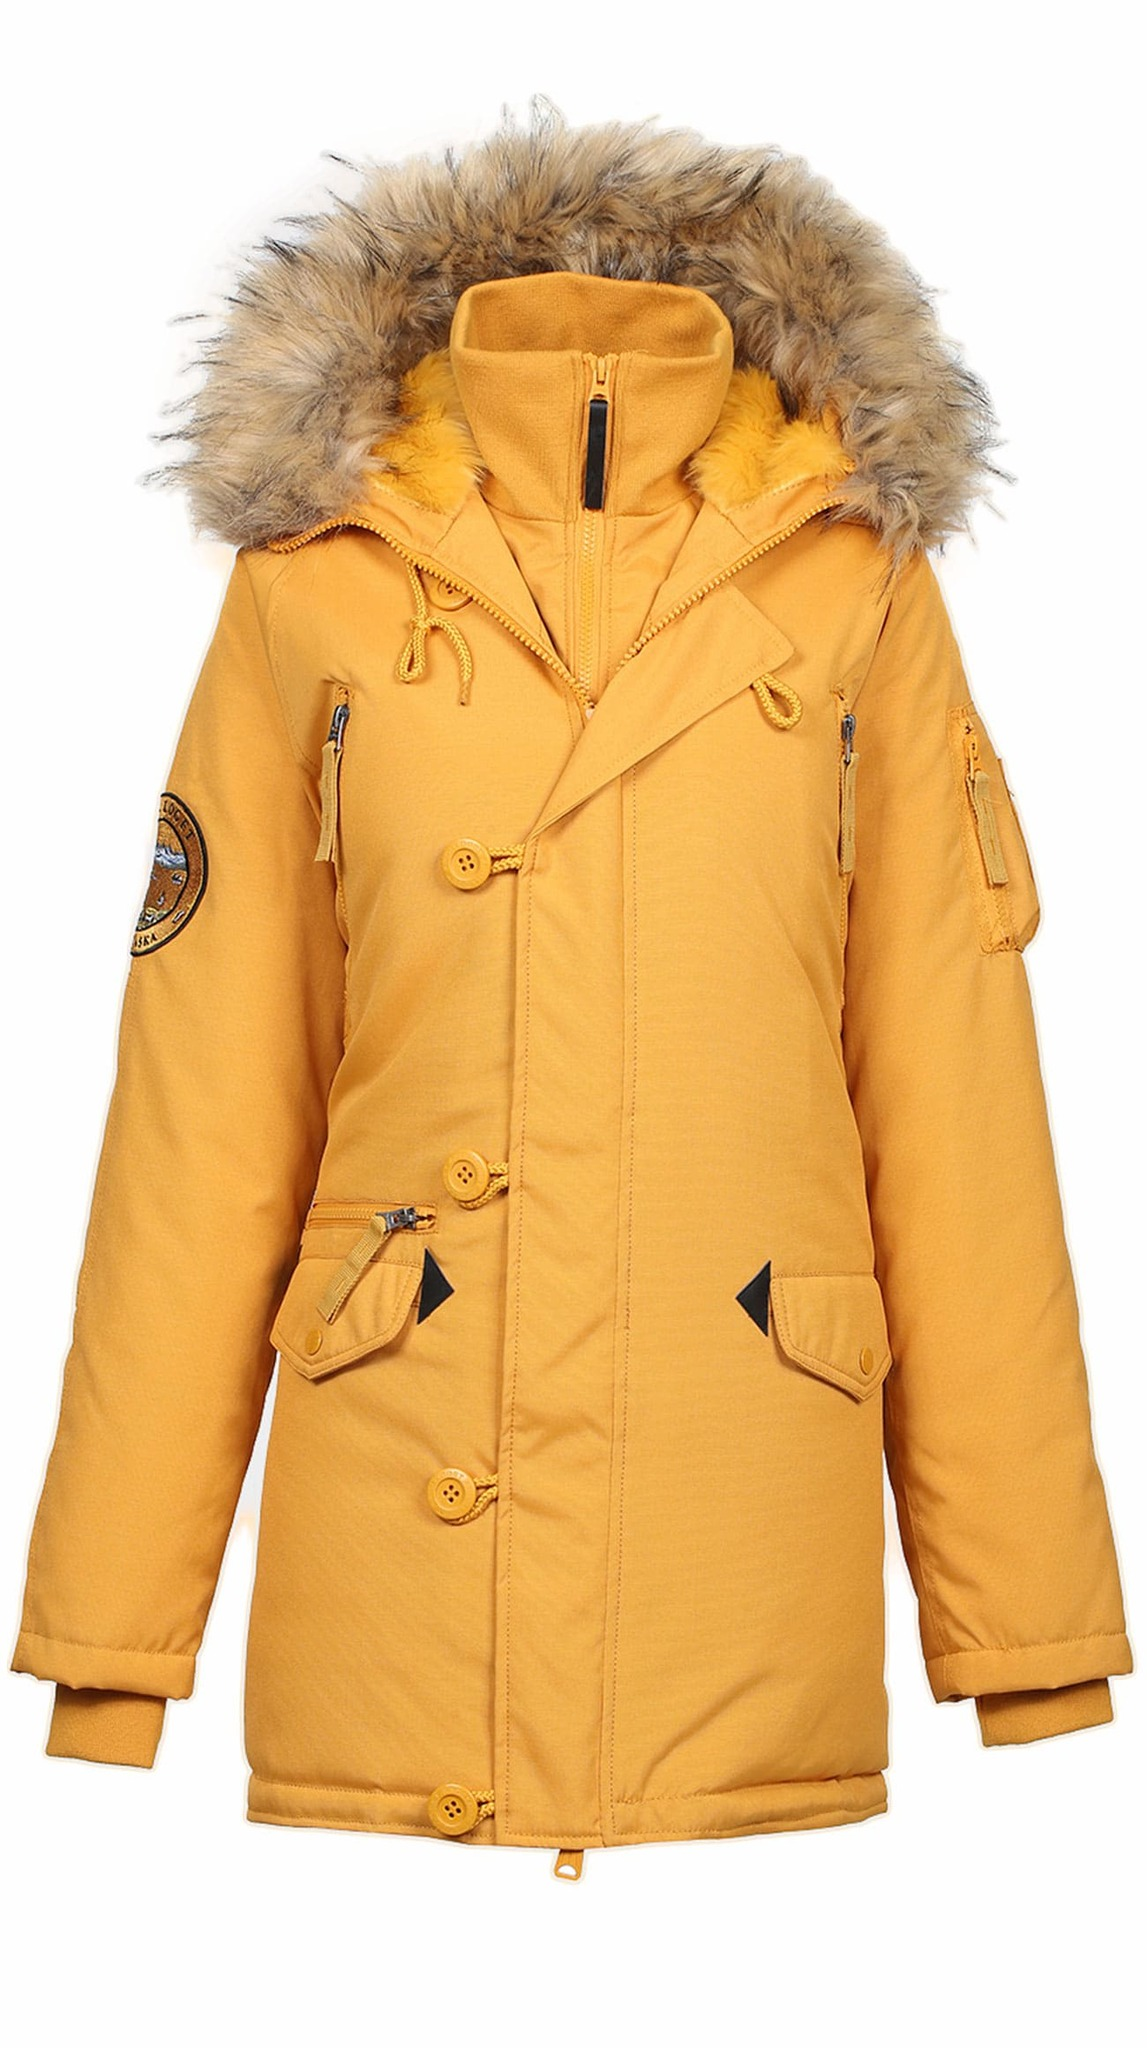 Куртка Аляска Женская - Apolloget Oxford Wmn (желтая - g.glow/amber)